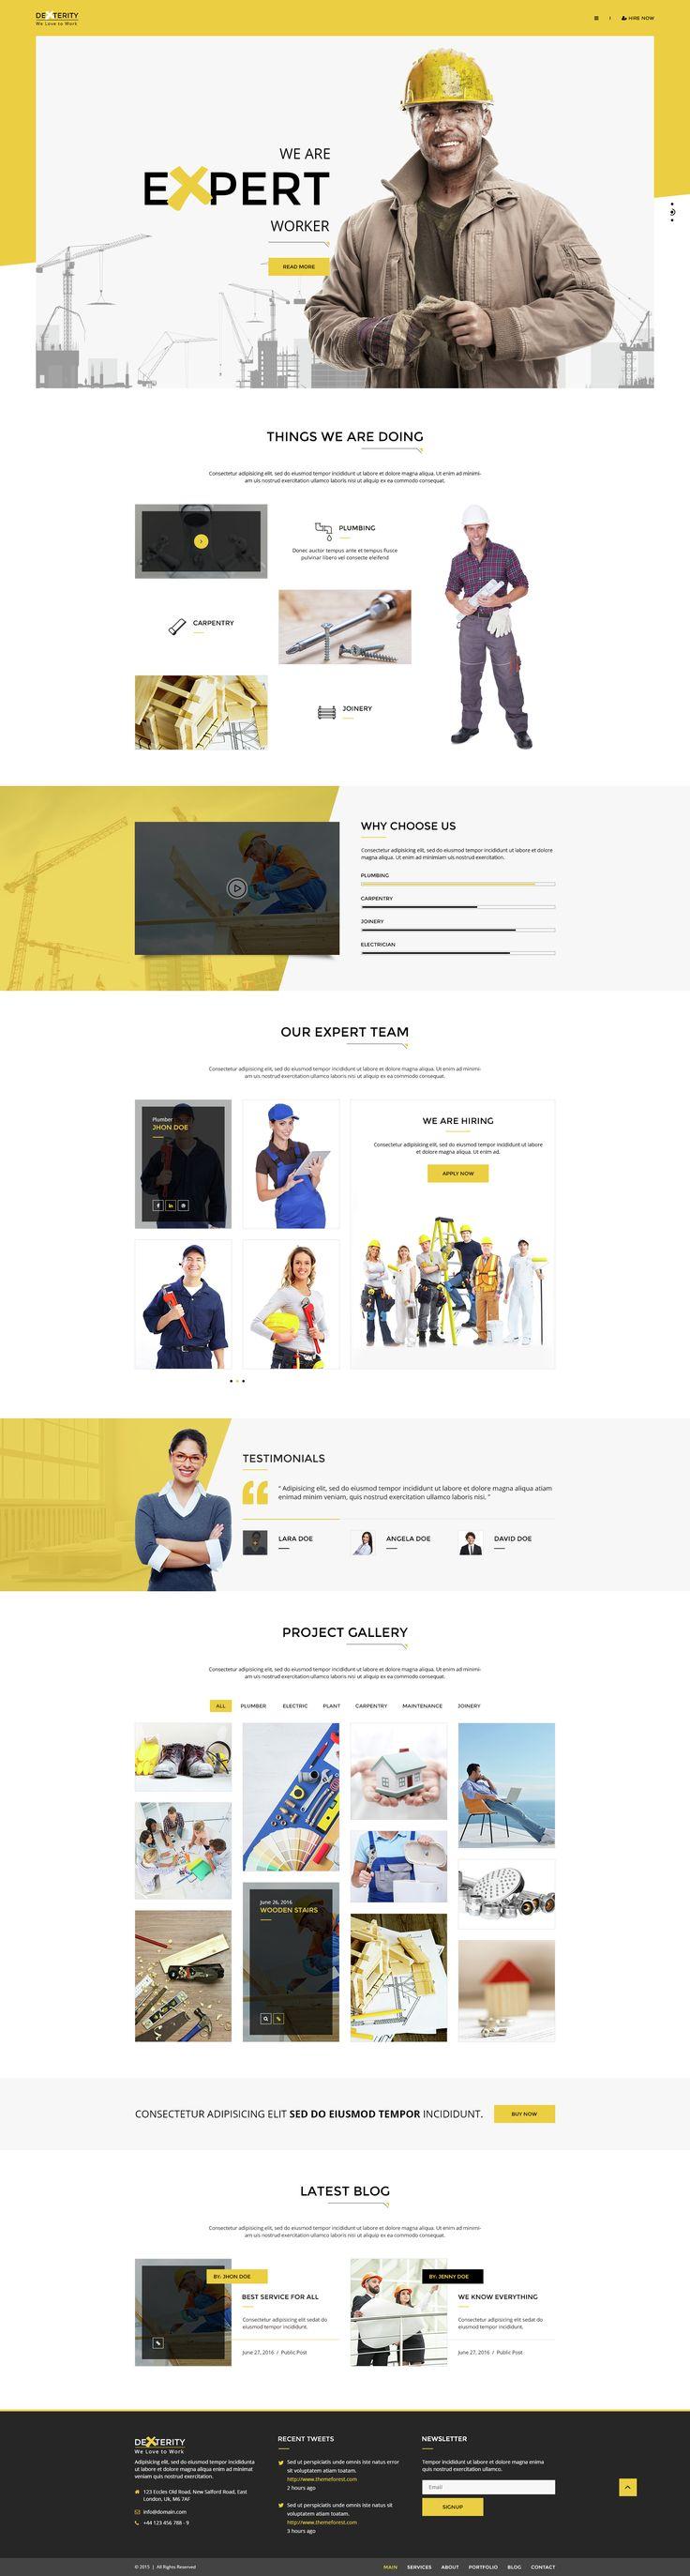 74 best Web Design ( Construction, Delivery ) images on Pinterest ...